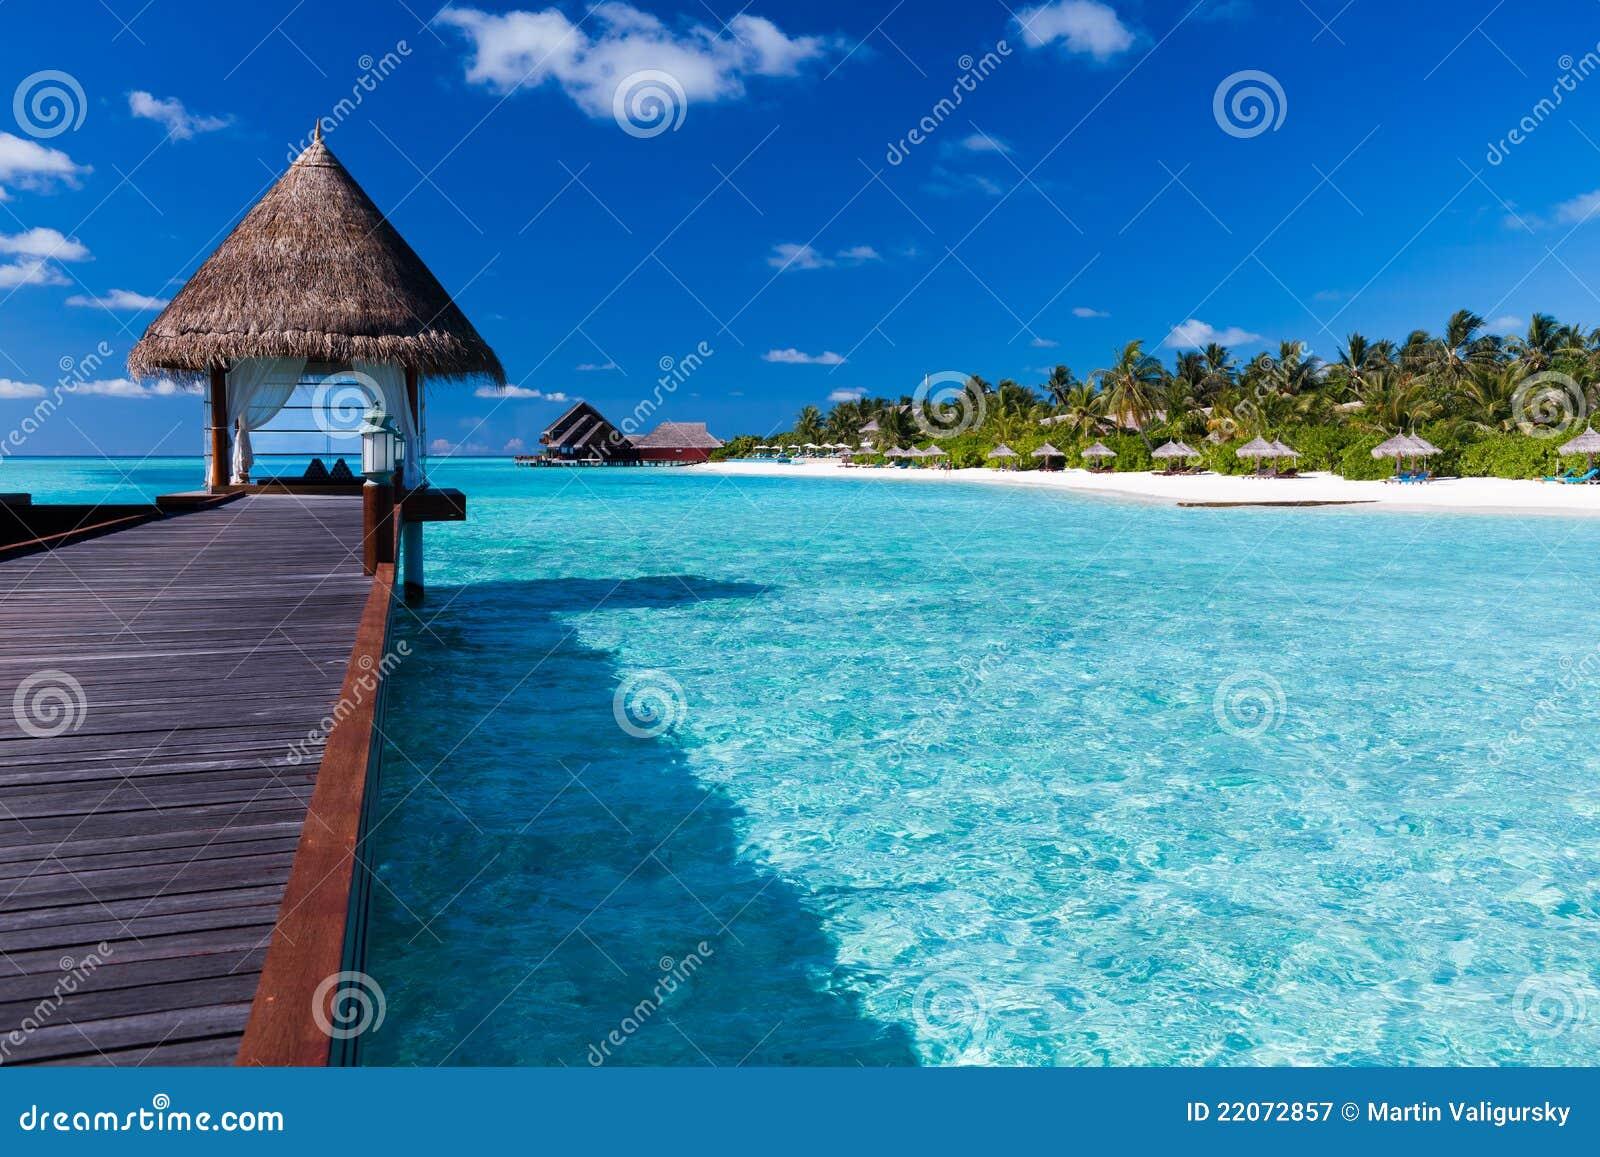 Lagoon Tropical Island: Overwater Spa In Lagoon Around Tropical Island Royalty